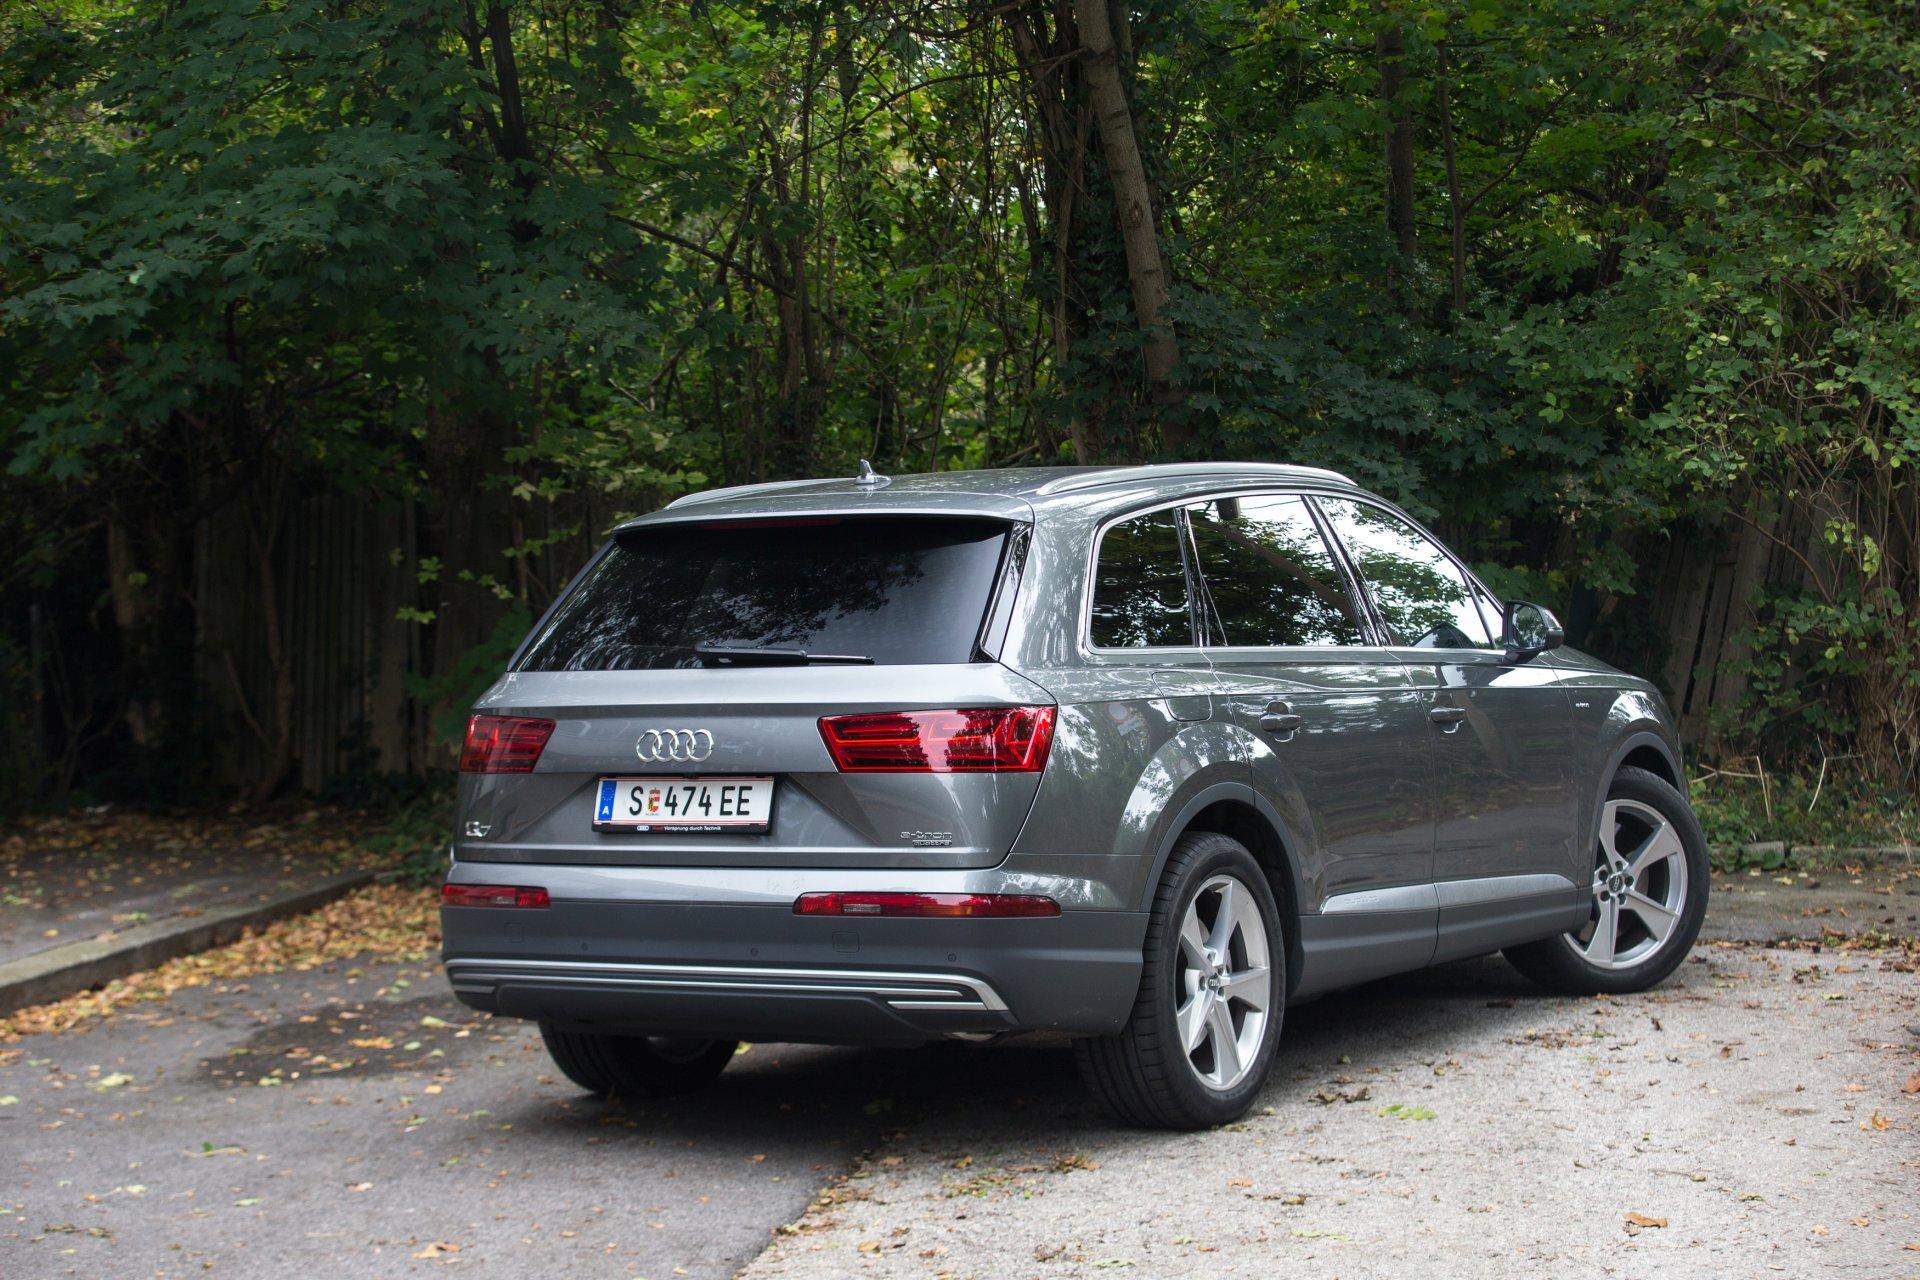 Test Audi Q7 E Tron Quattro Alles Auto